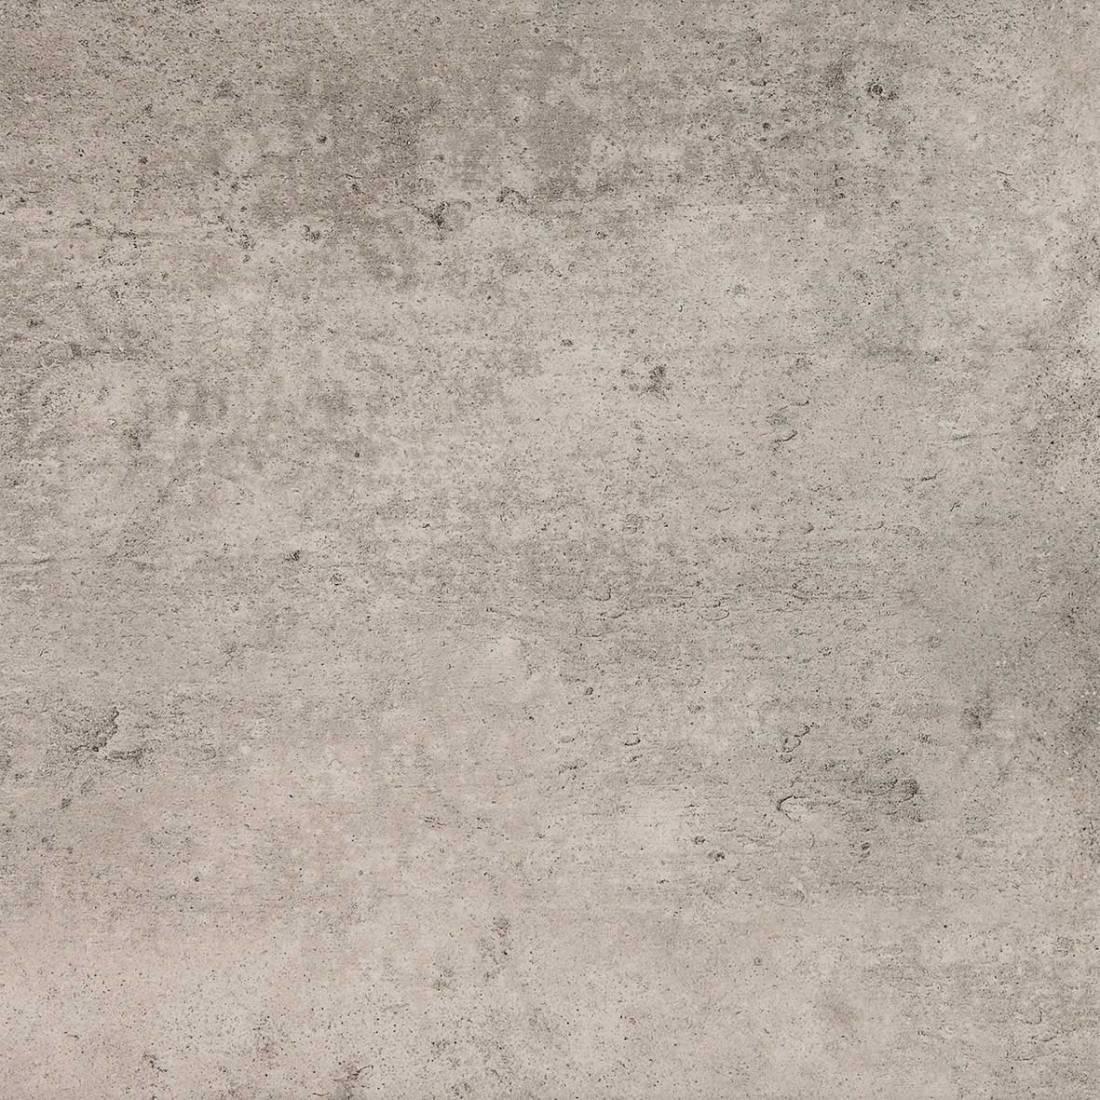 Madrid 42.5x42.5 Light Grey 1